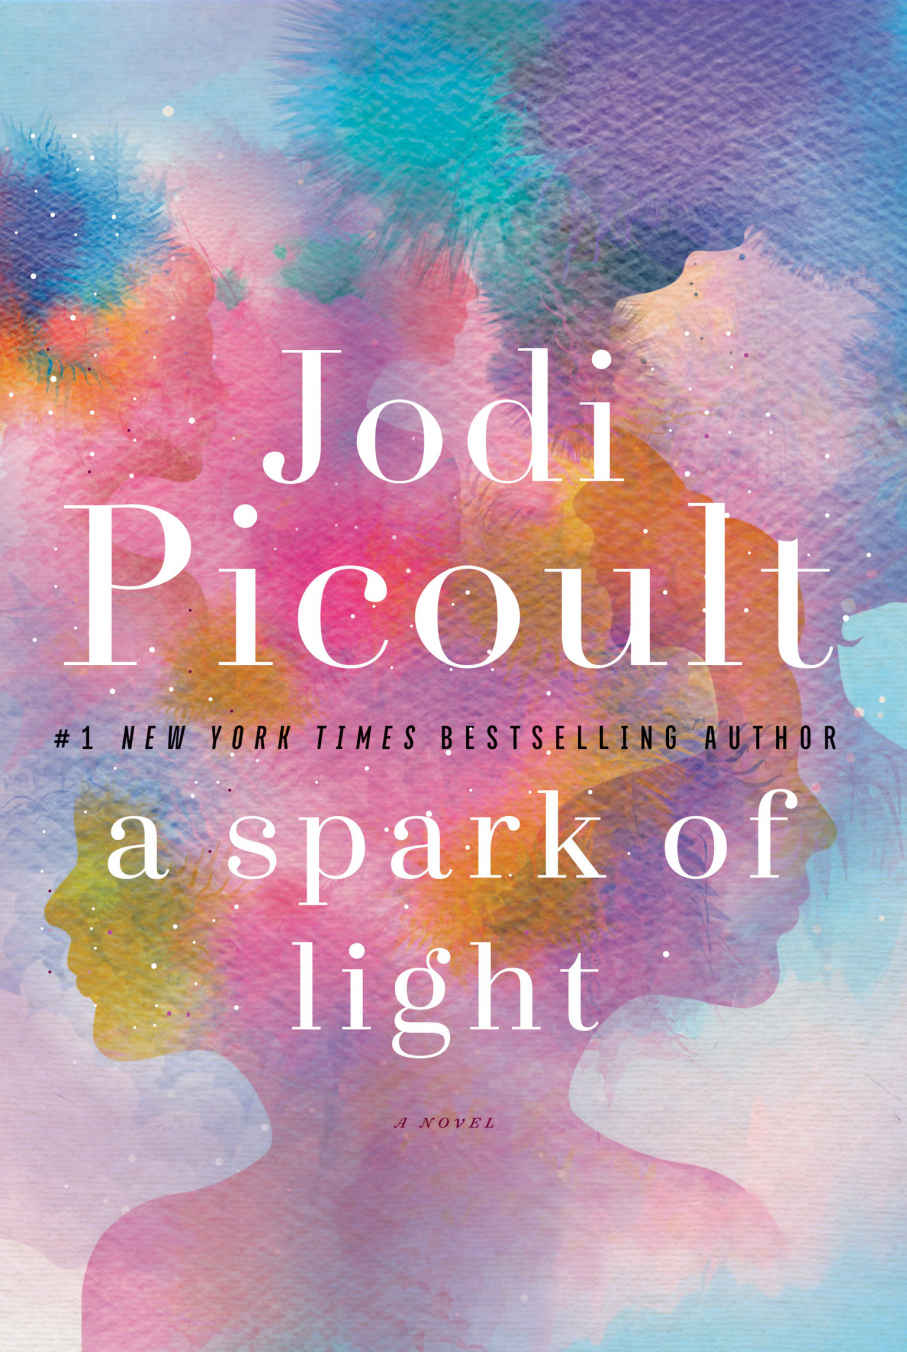 A Spark of Light: A Novel - Jodi Picoult [kindle] [mobi]